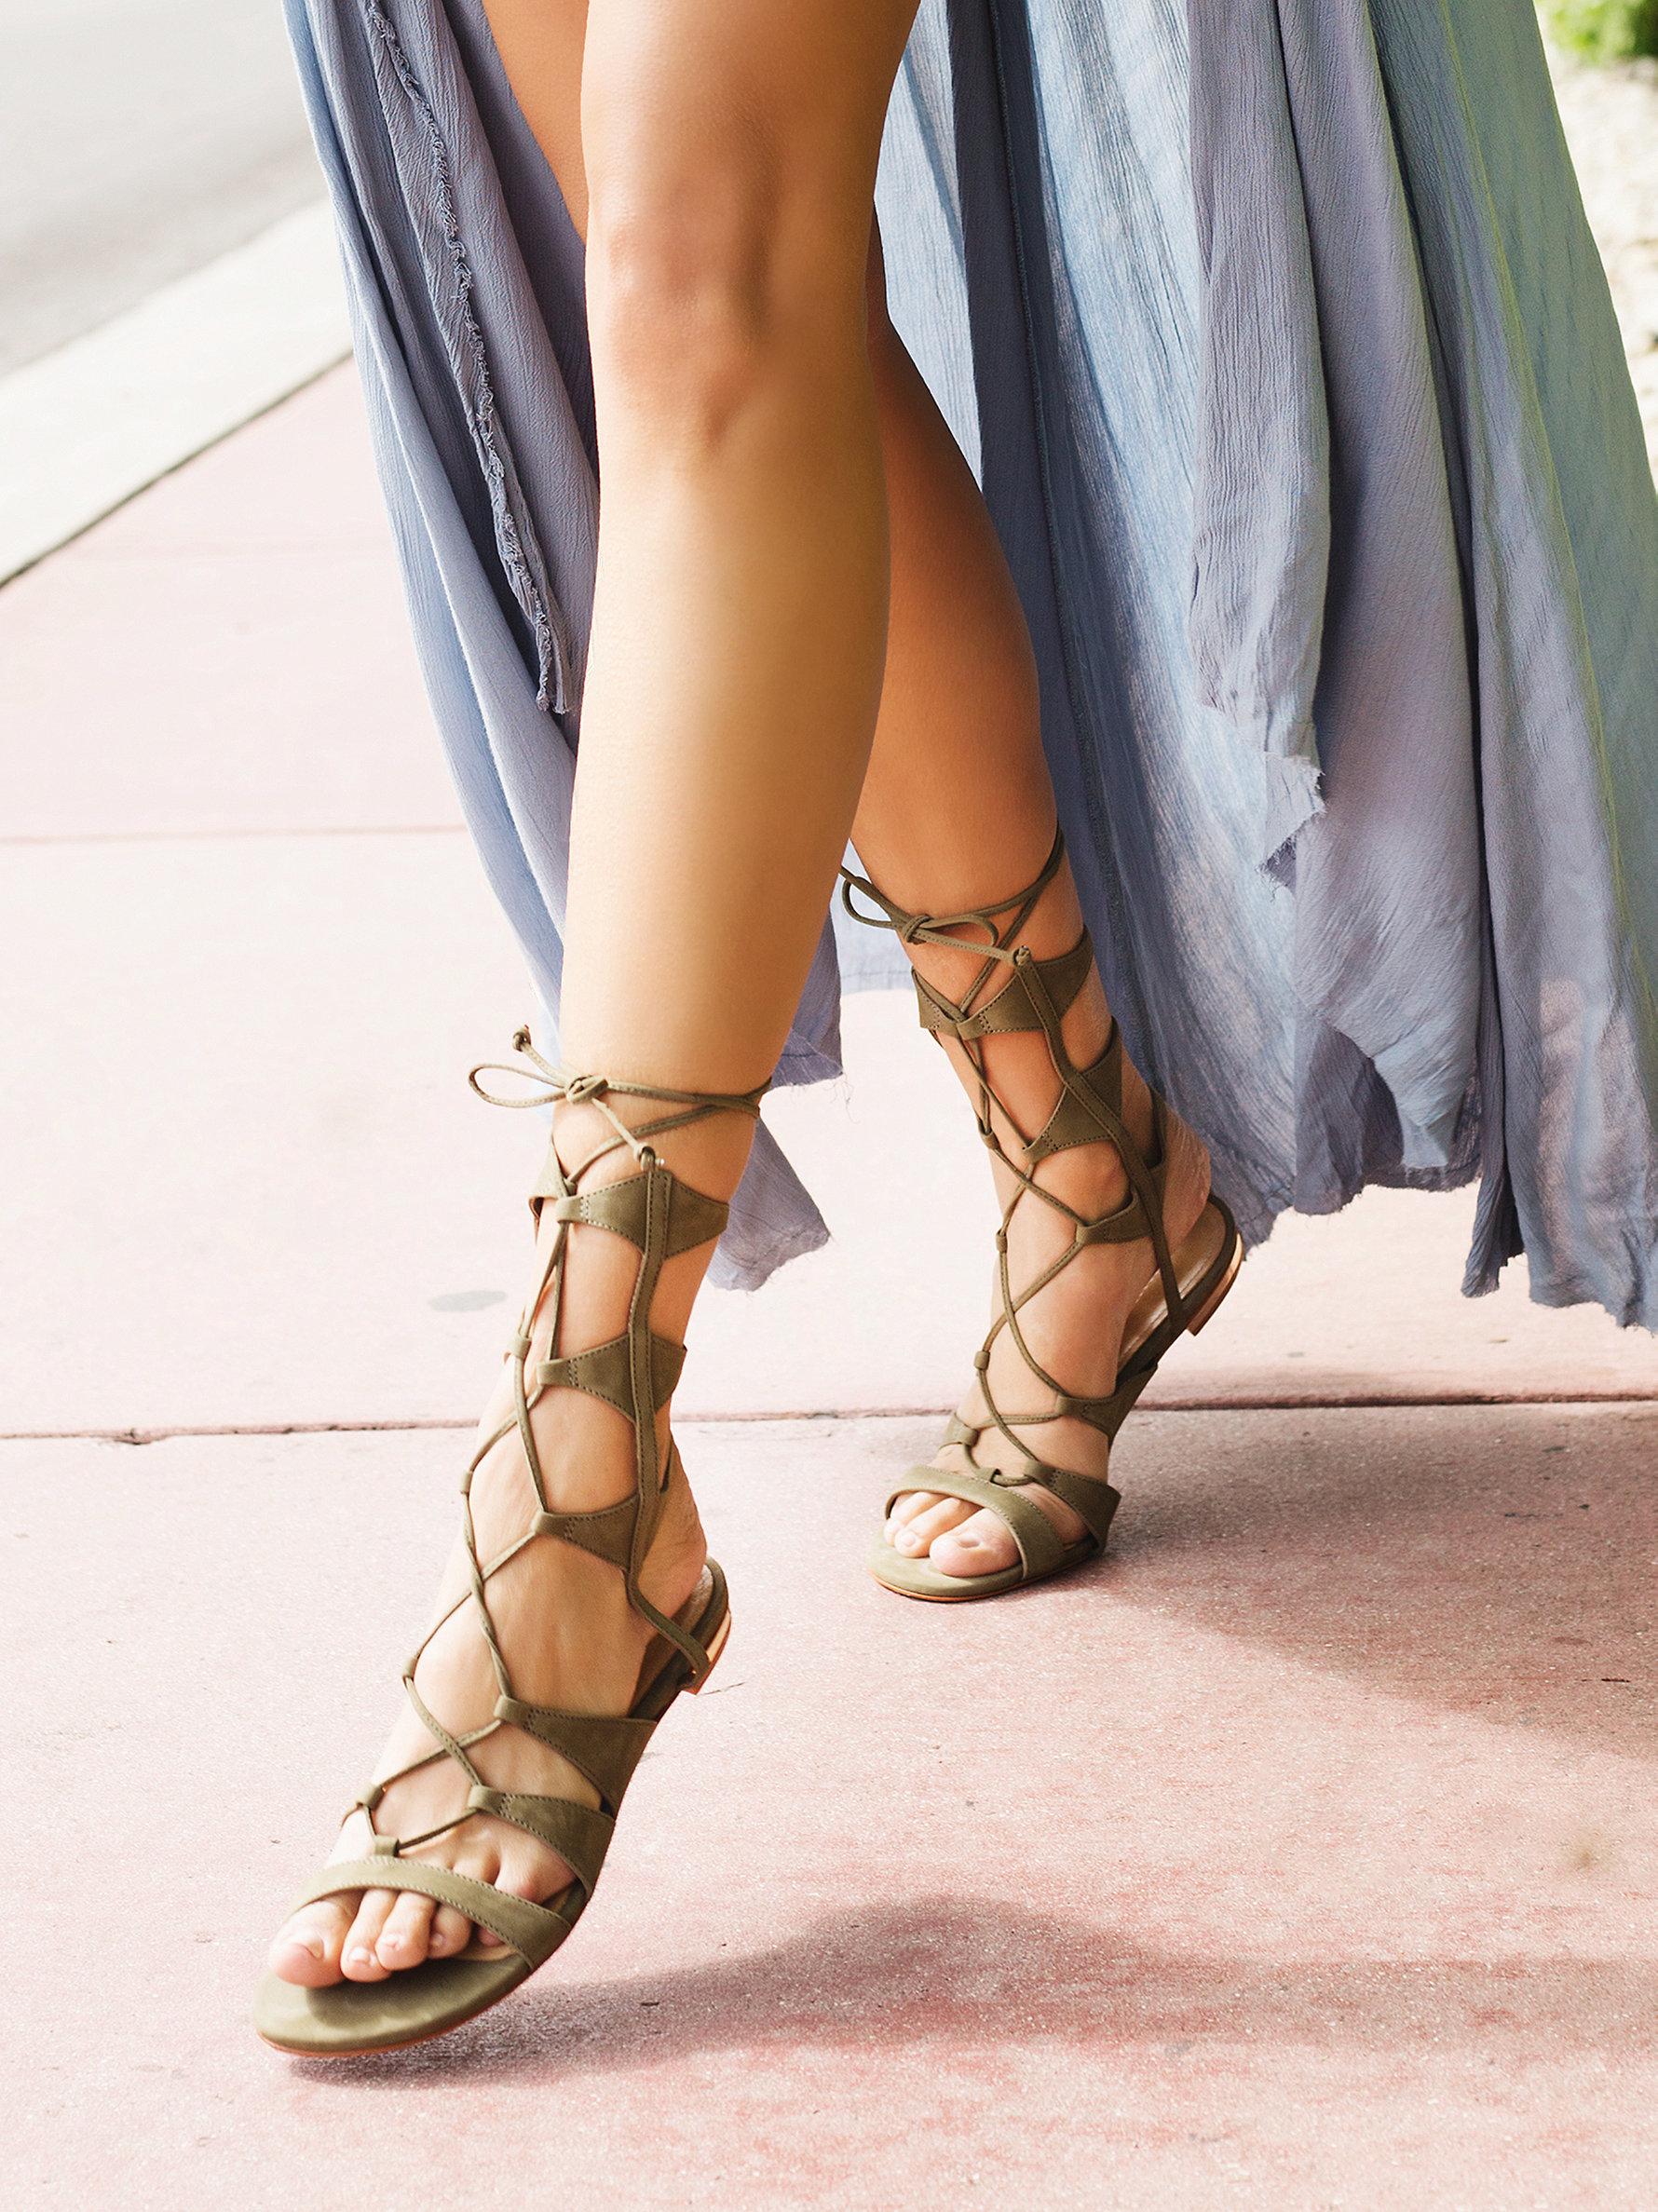 b0ea0885c8d Gallery. Women s Lace Up Flats Women s Gladiator Sandals ...